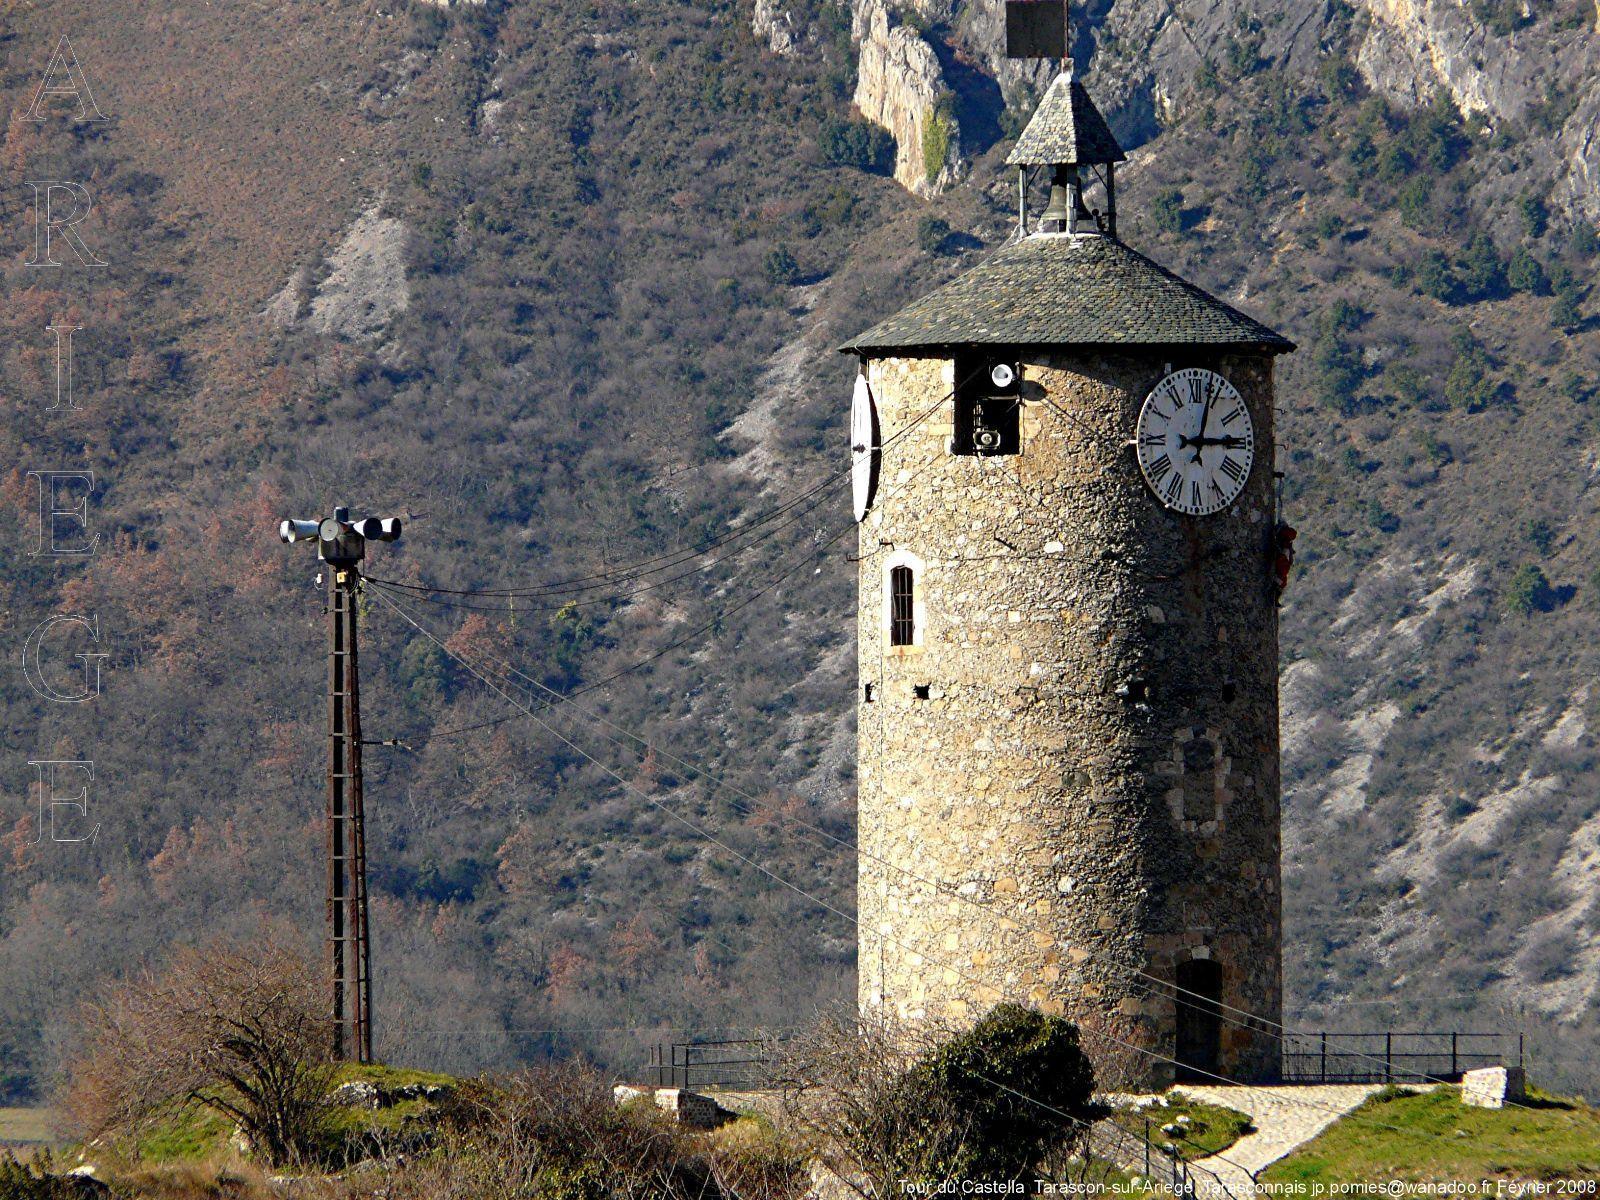 Tarascon sur ari ge tour du castella ariege pyr n es midi pyr n es et ari ge - Office du tourisme de tarascon sur ariege ...